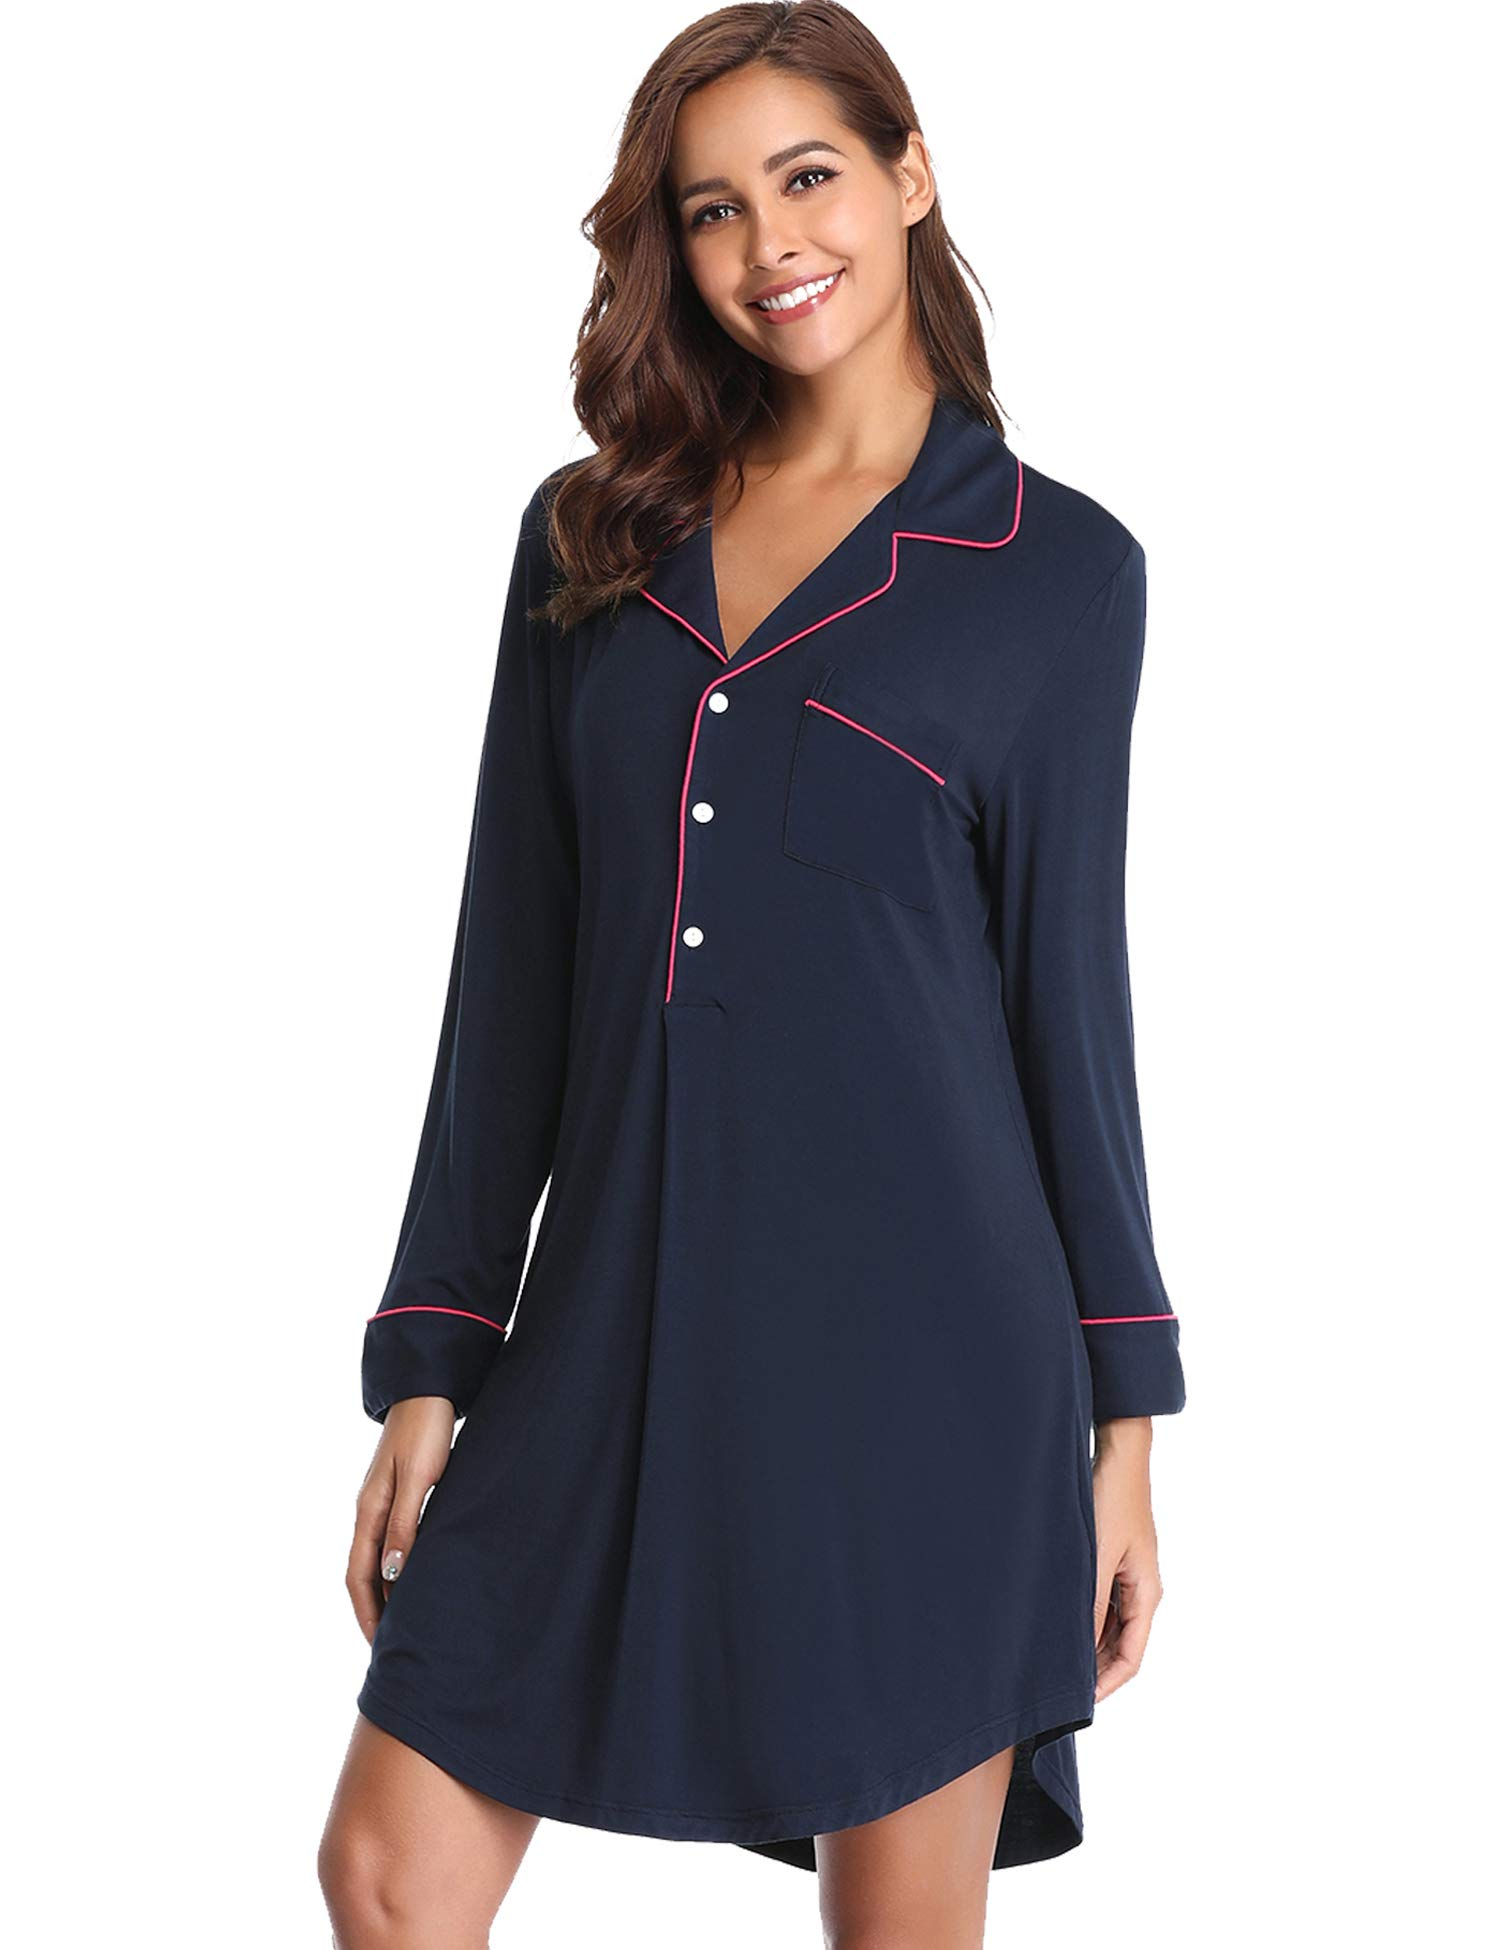 Lusofie Long Sleeve Nightgown Women Button-up Nightshirt Lapel Pajama Dress (Navy Blue,L)